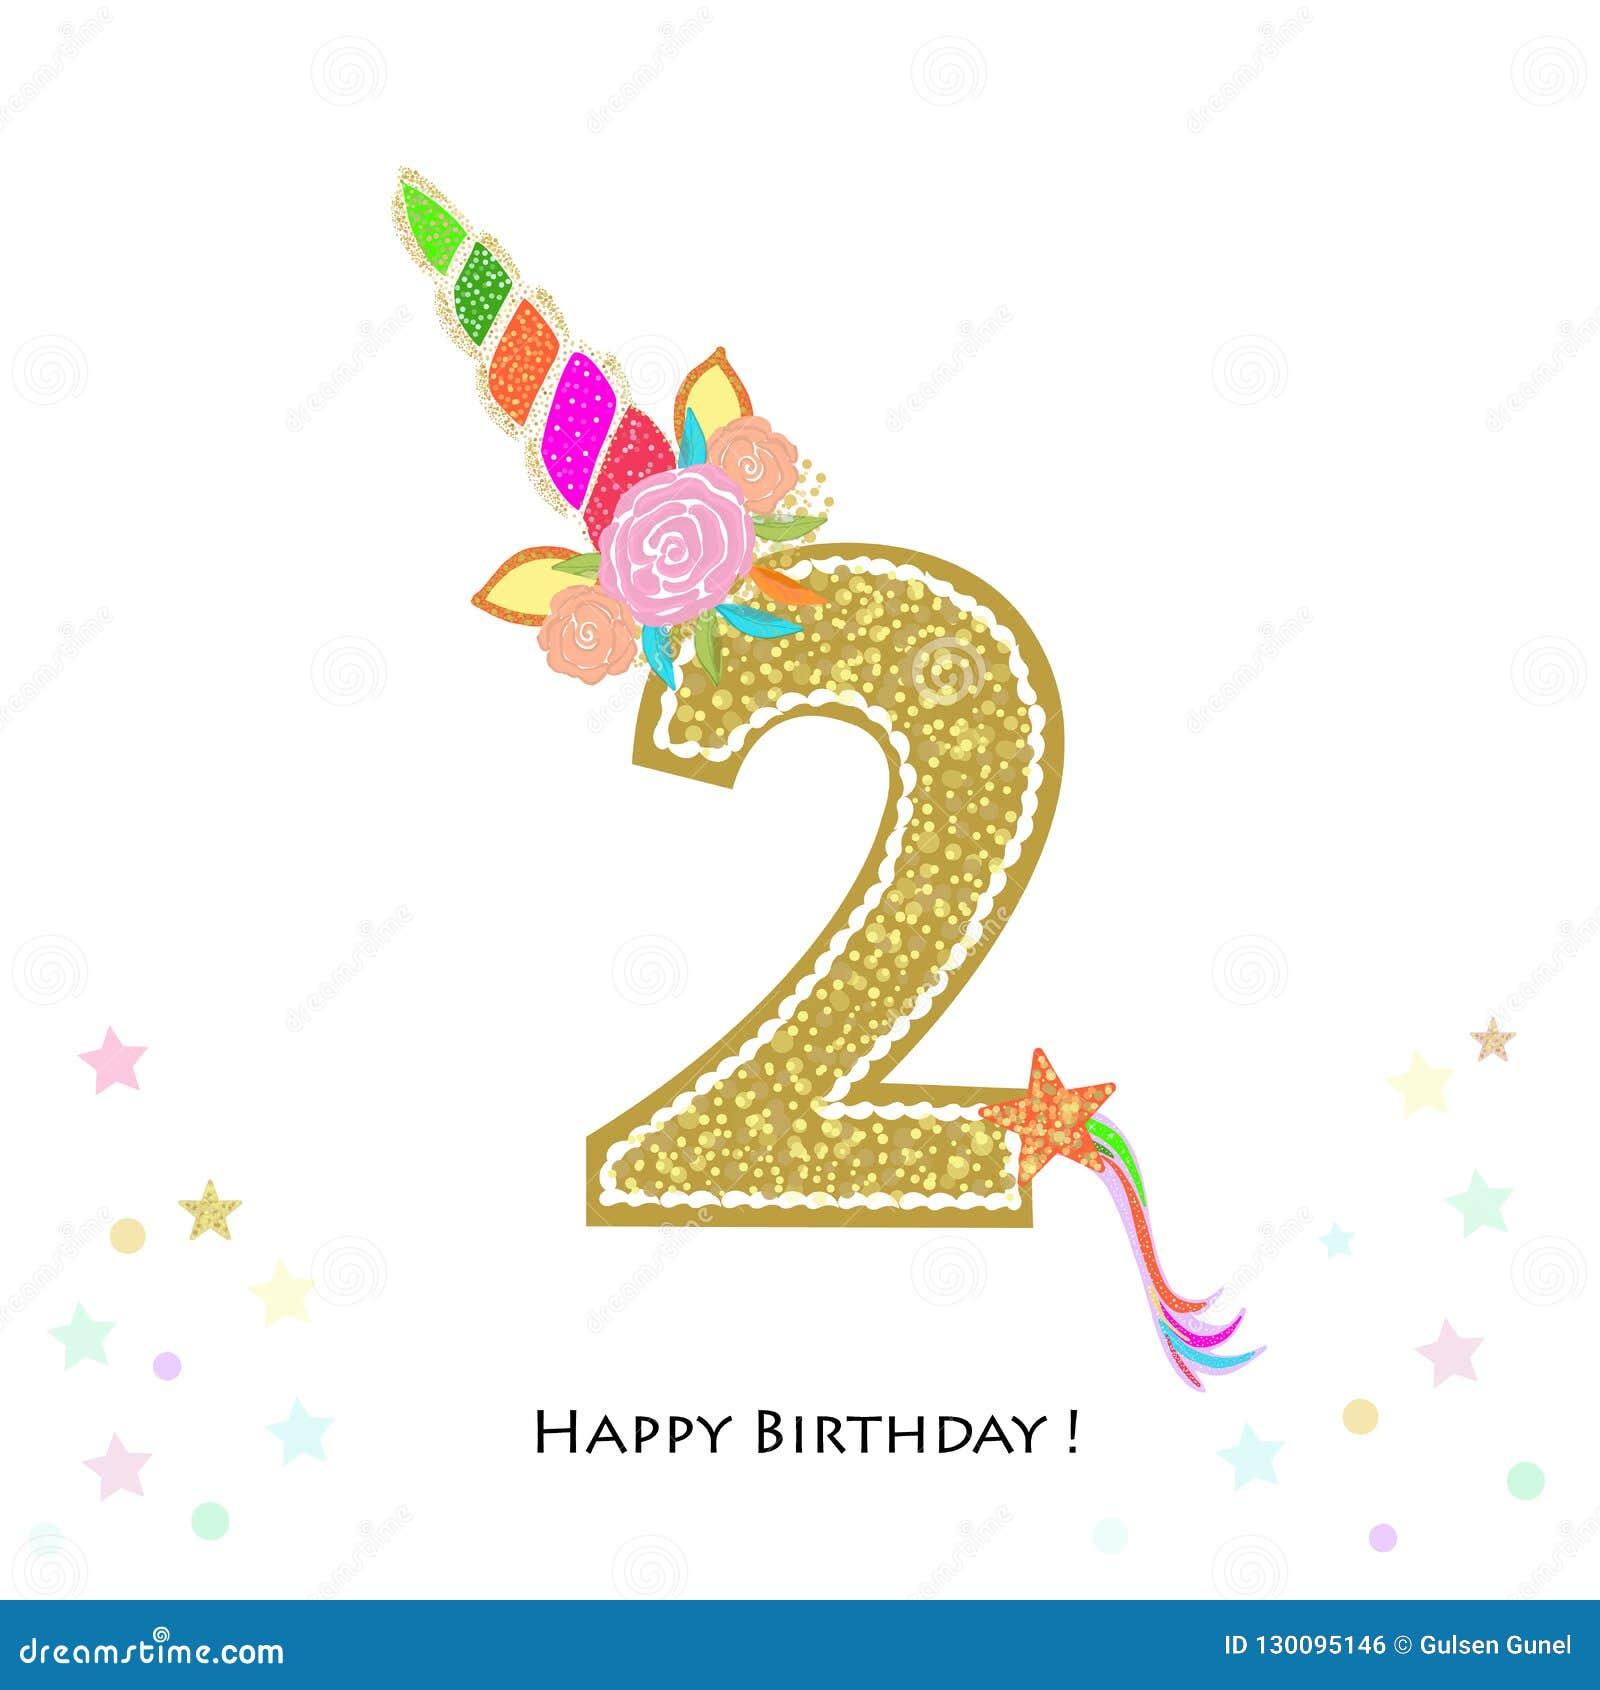 Two Second Birthday Colorful Unicorn Birthday Invitation